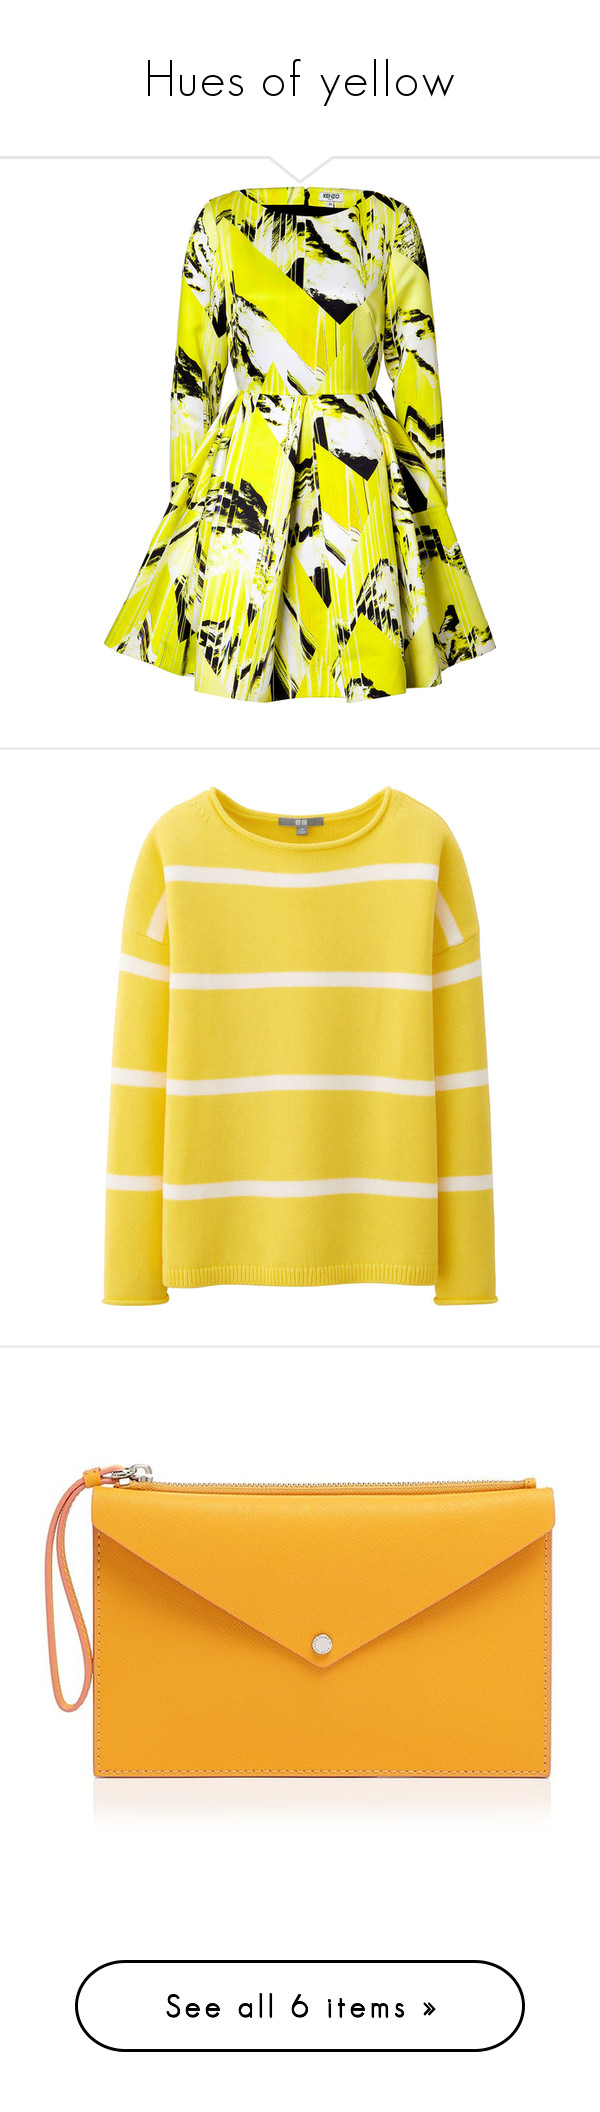 Yellow dress long sleeve  Hues of yellow